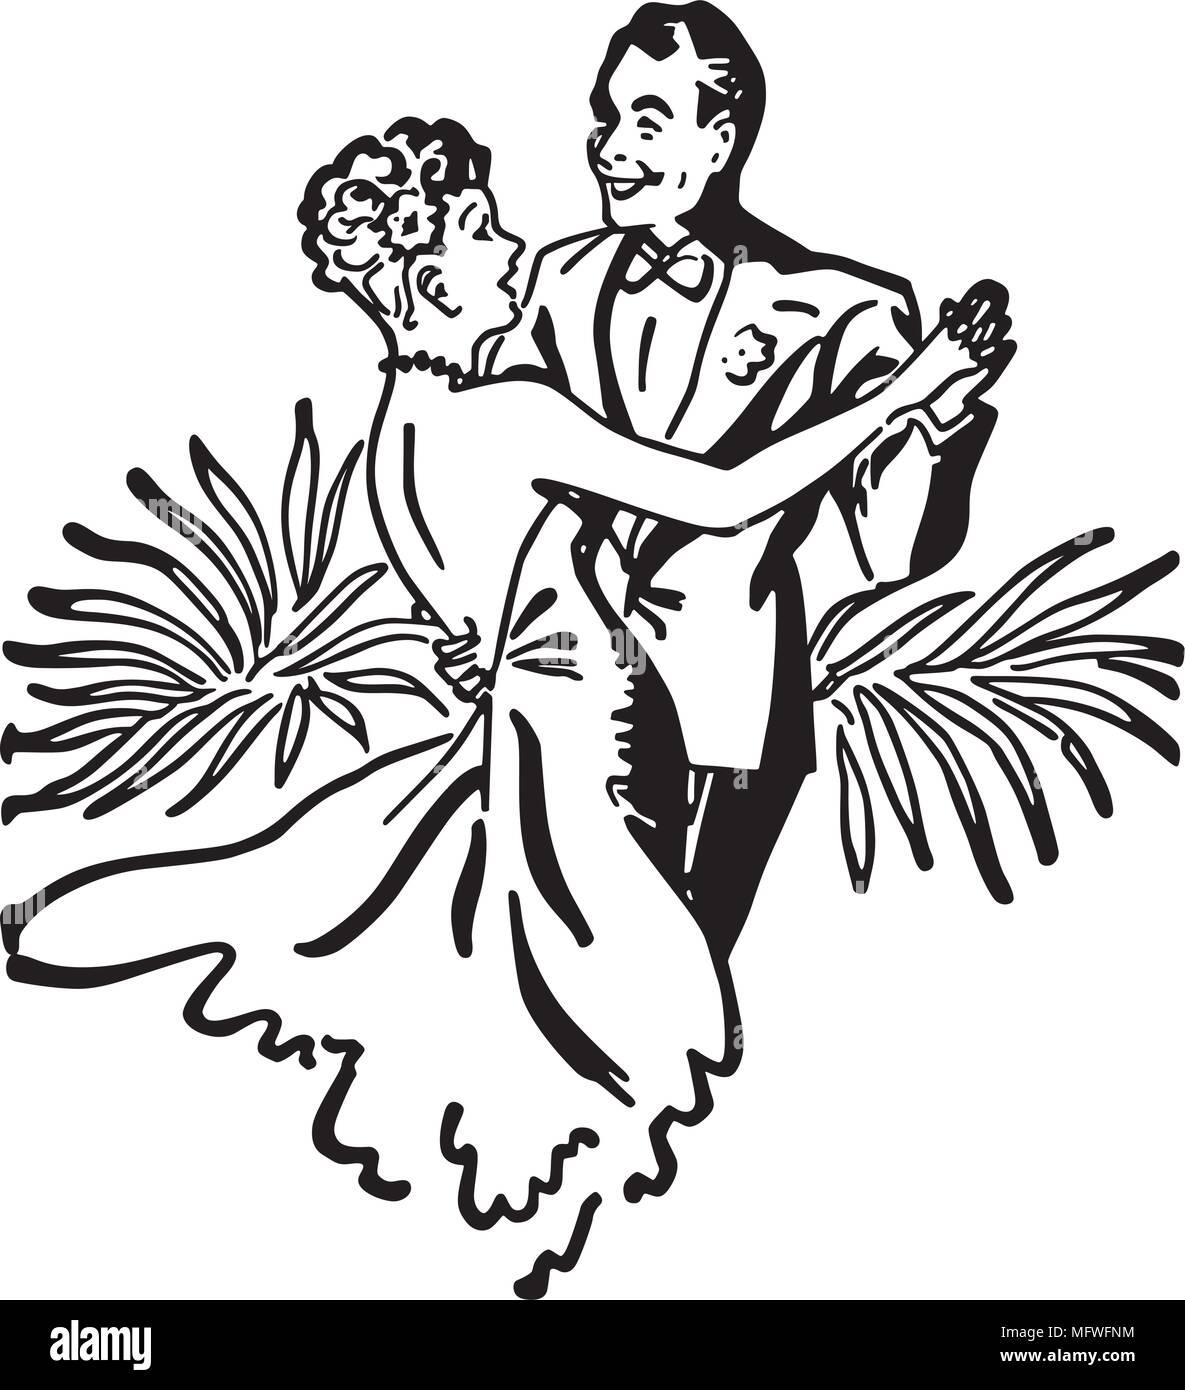 Disco Dancer Silhouette - Retro Dance Silhouette Png, Transparent Png -  kindpng